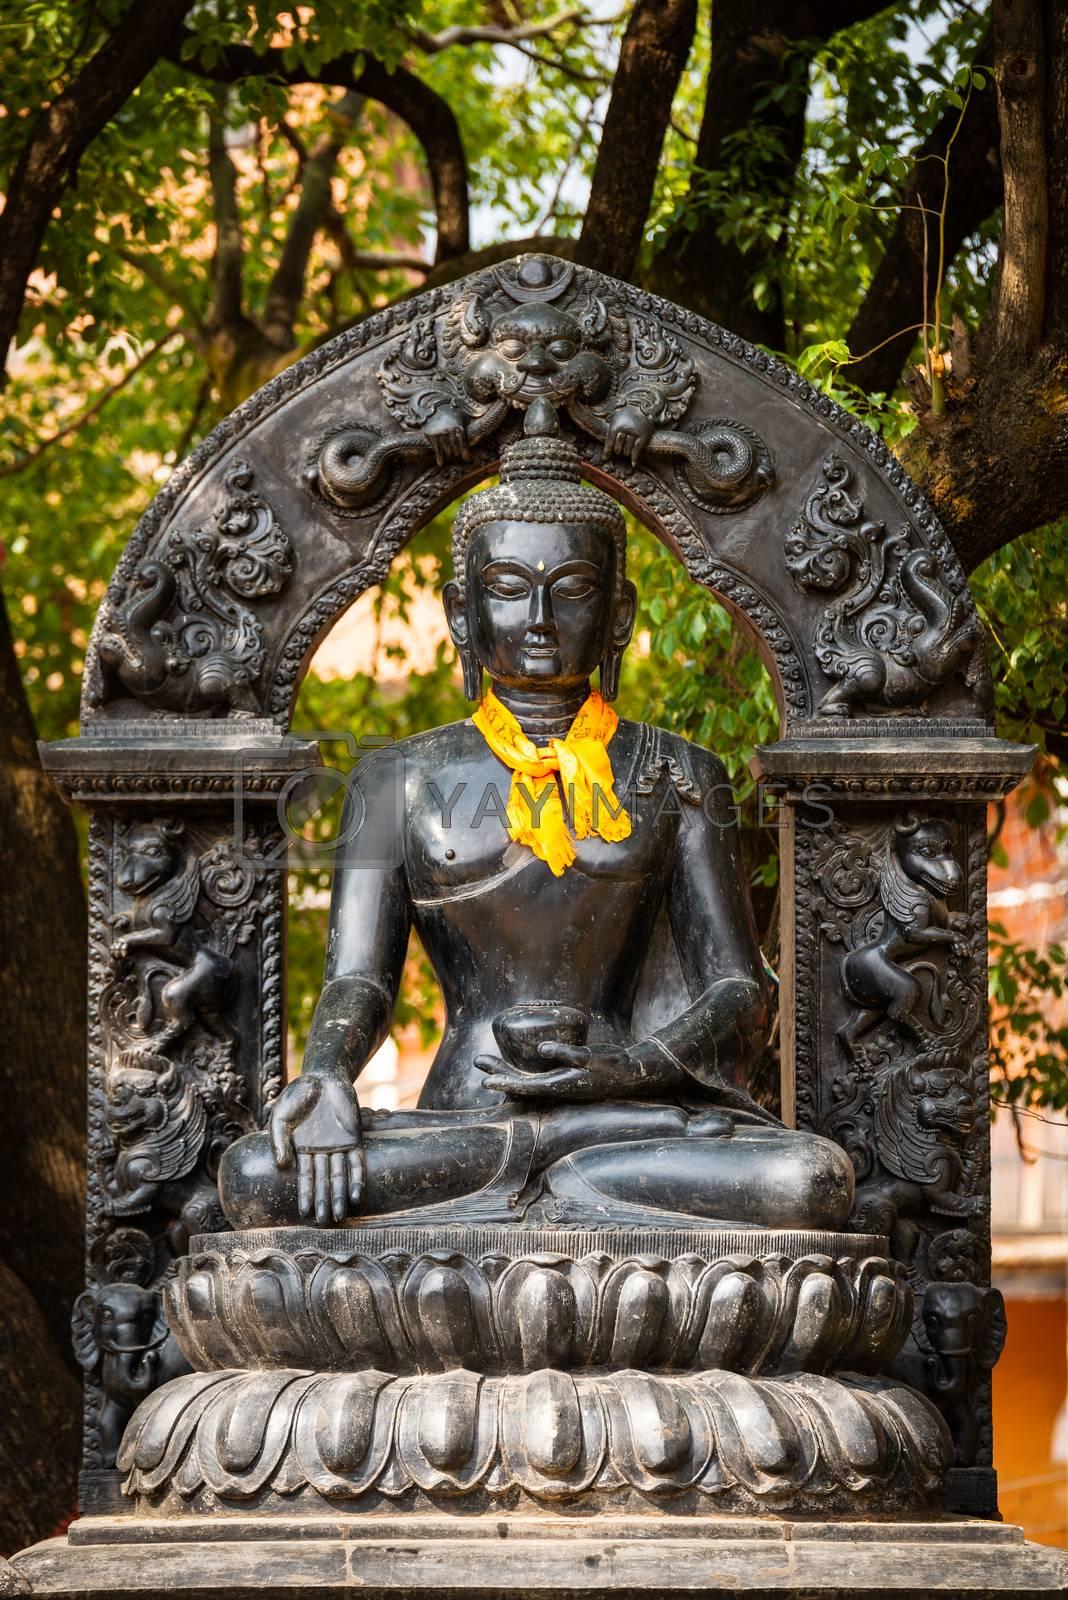 Statue of Buddha wearing an orange khata (scarf) in Patan, Nepal